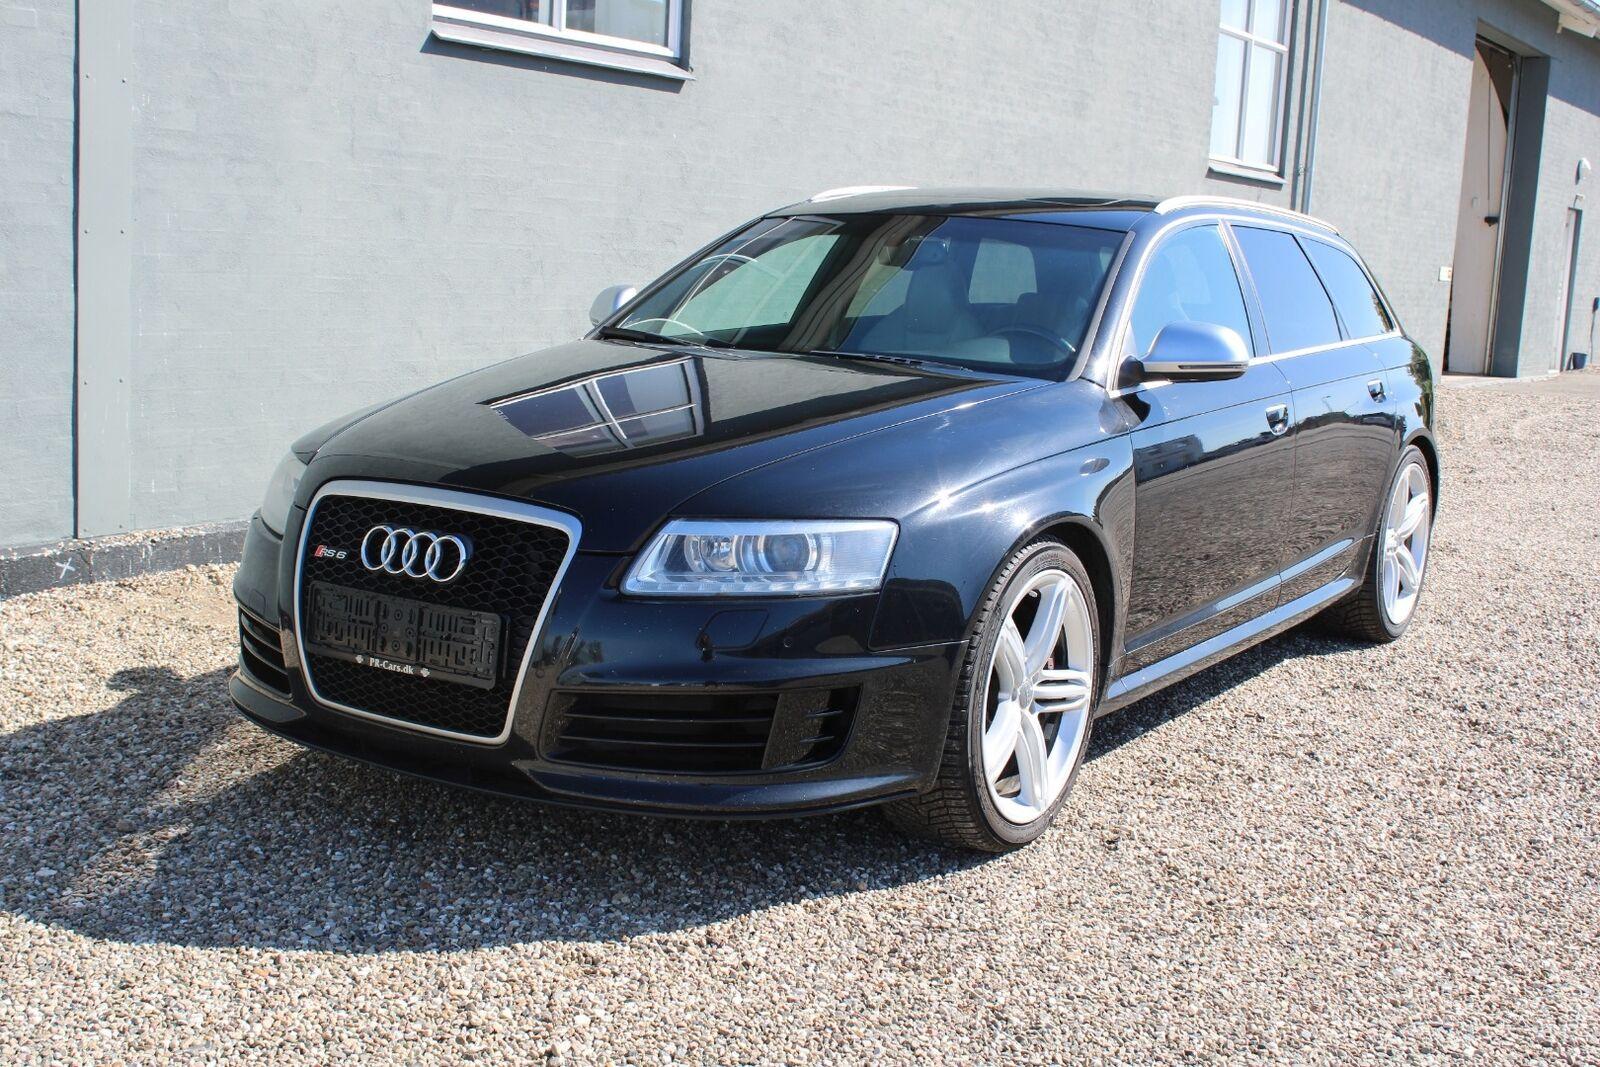 Audi RS6 5,0 TFSi Avant quattro Tiptr. 5d - 2.533 kr.